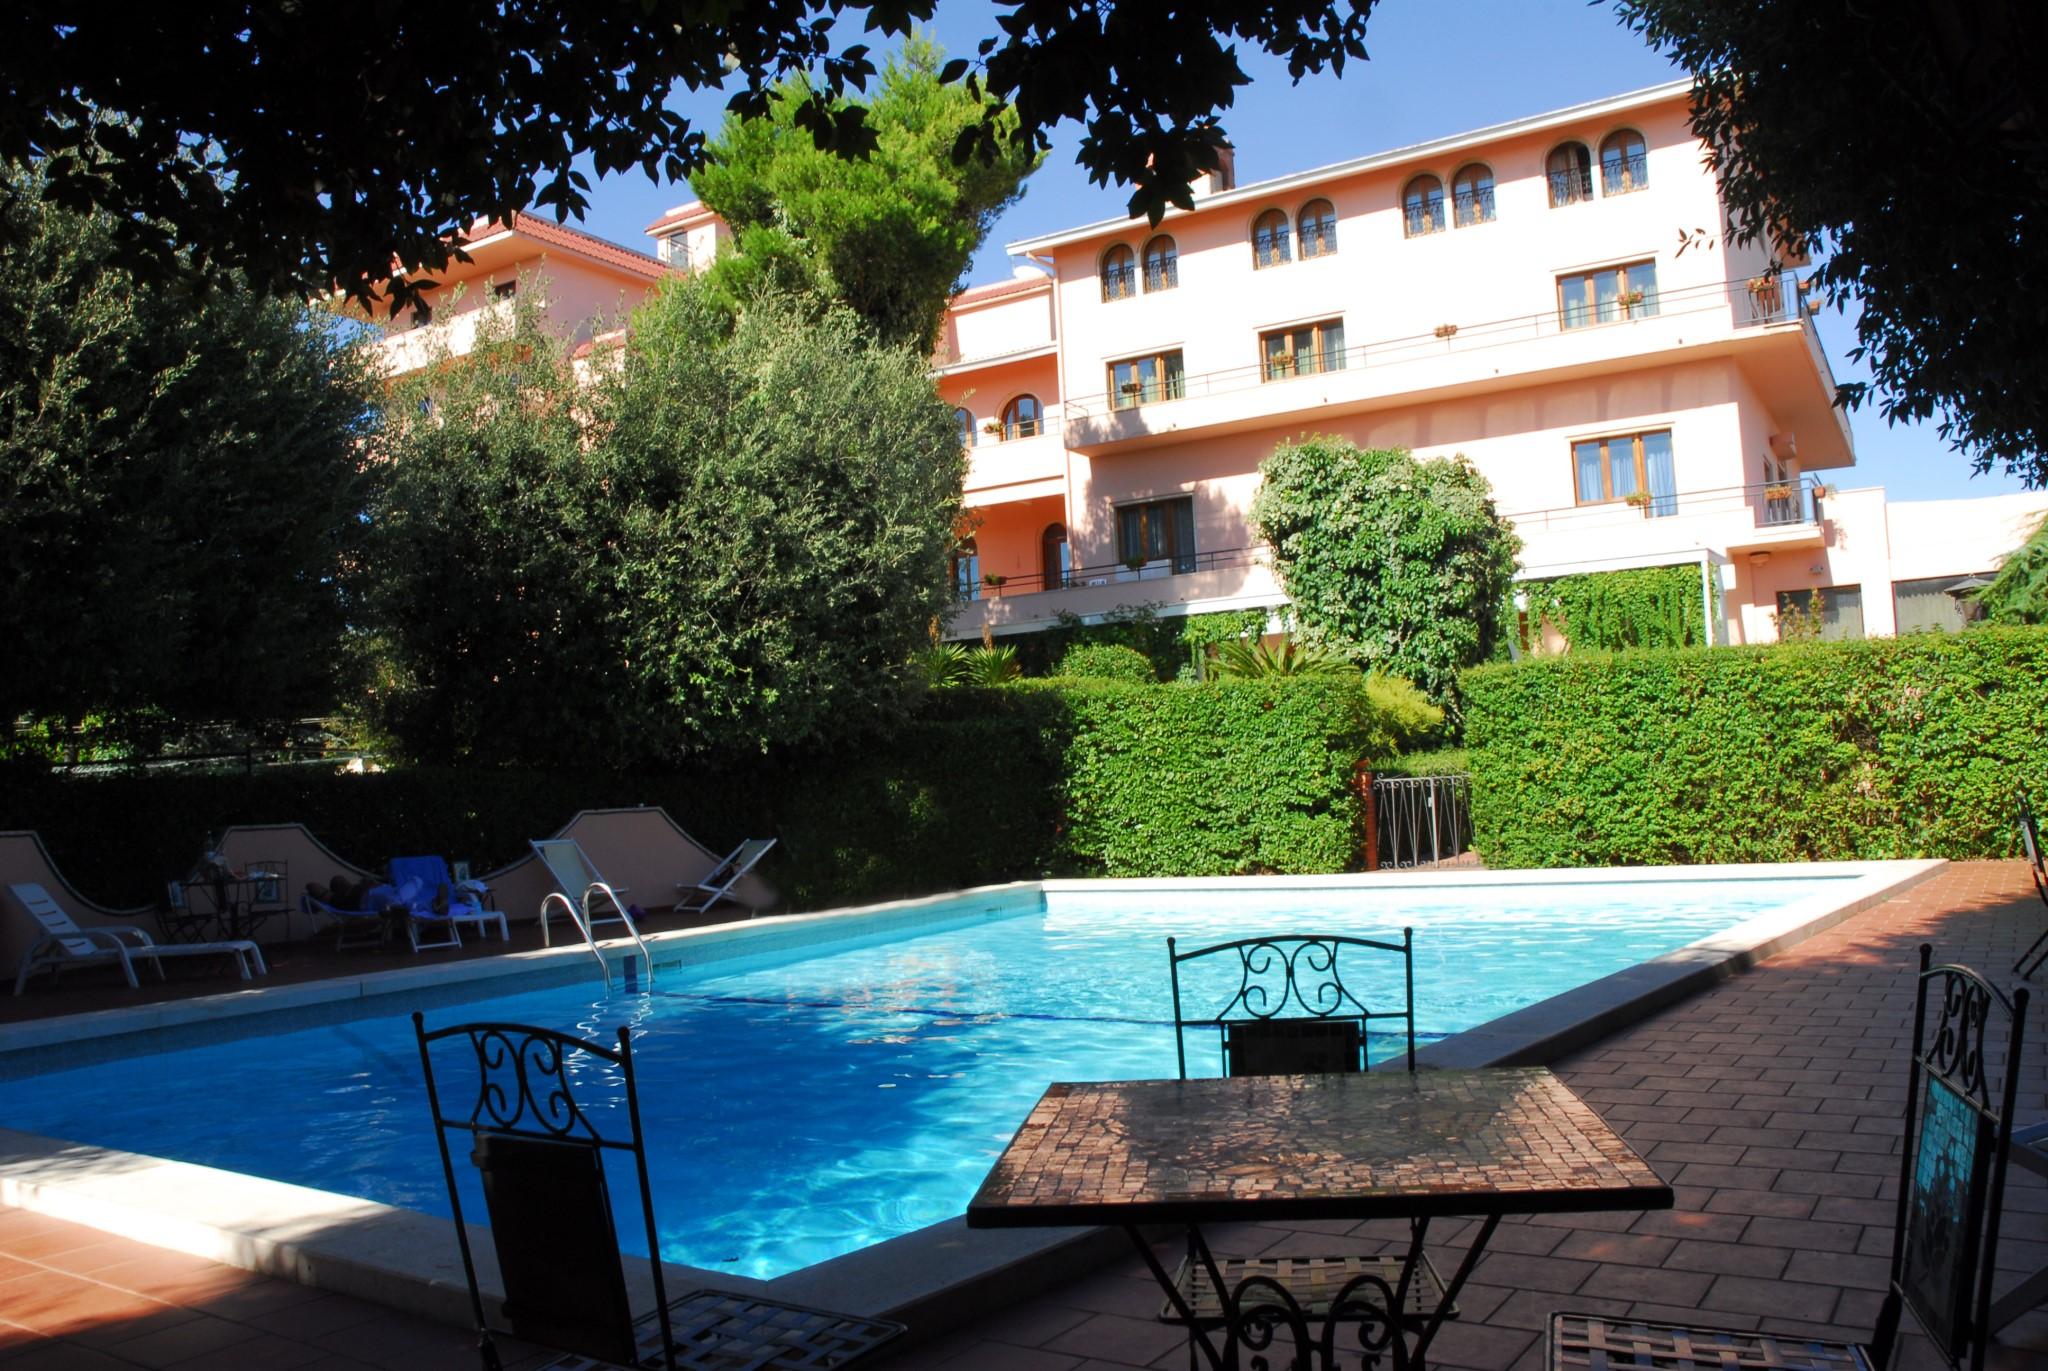 Park Hotel San Michele | Hotel 4 Stelle Martina Franca